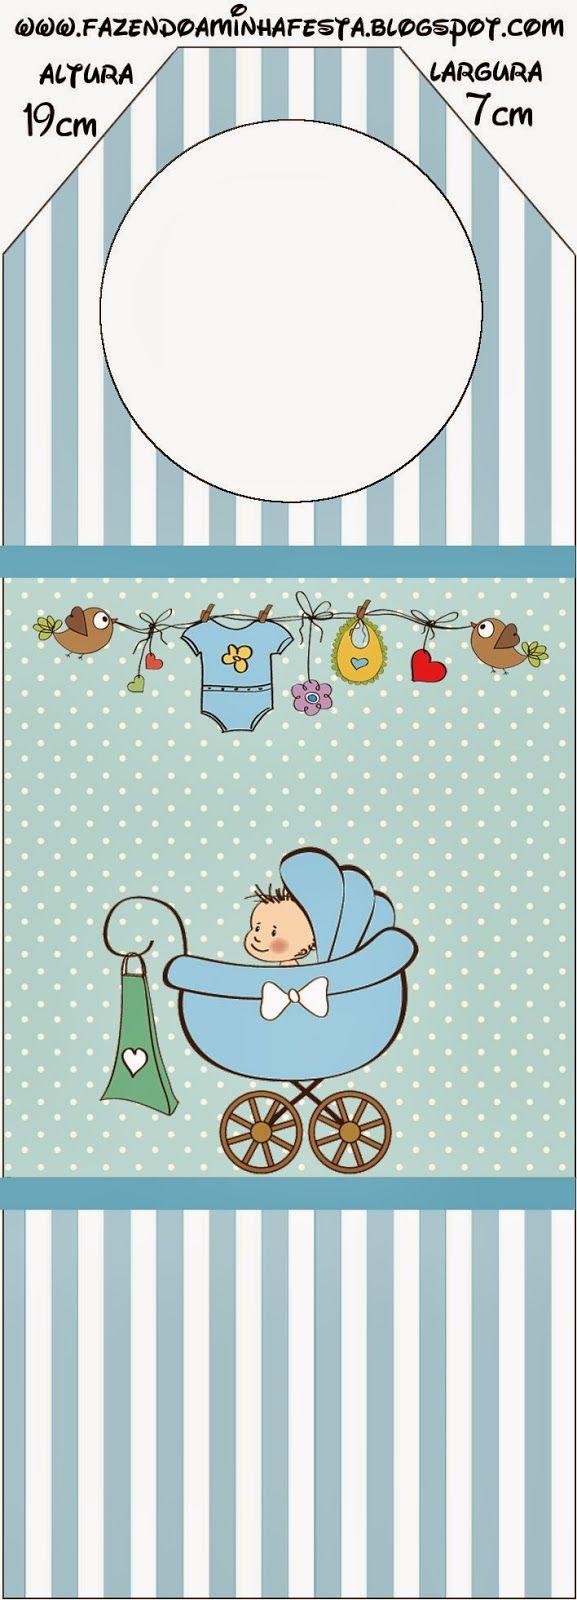 Cochecito Celeste de Bebé: Imprimibles Gratis para Fiestas.